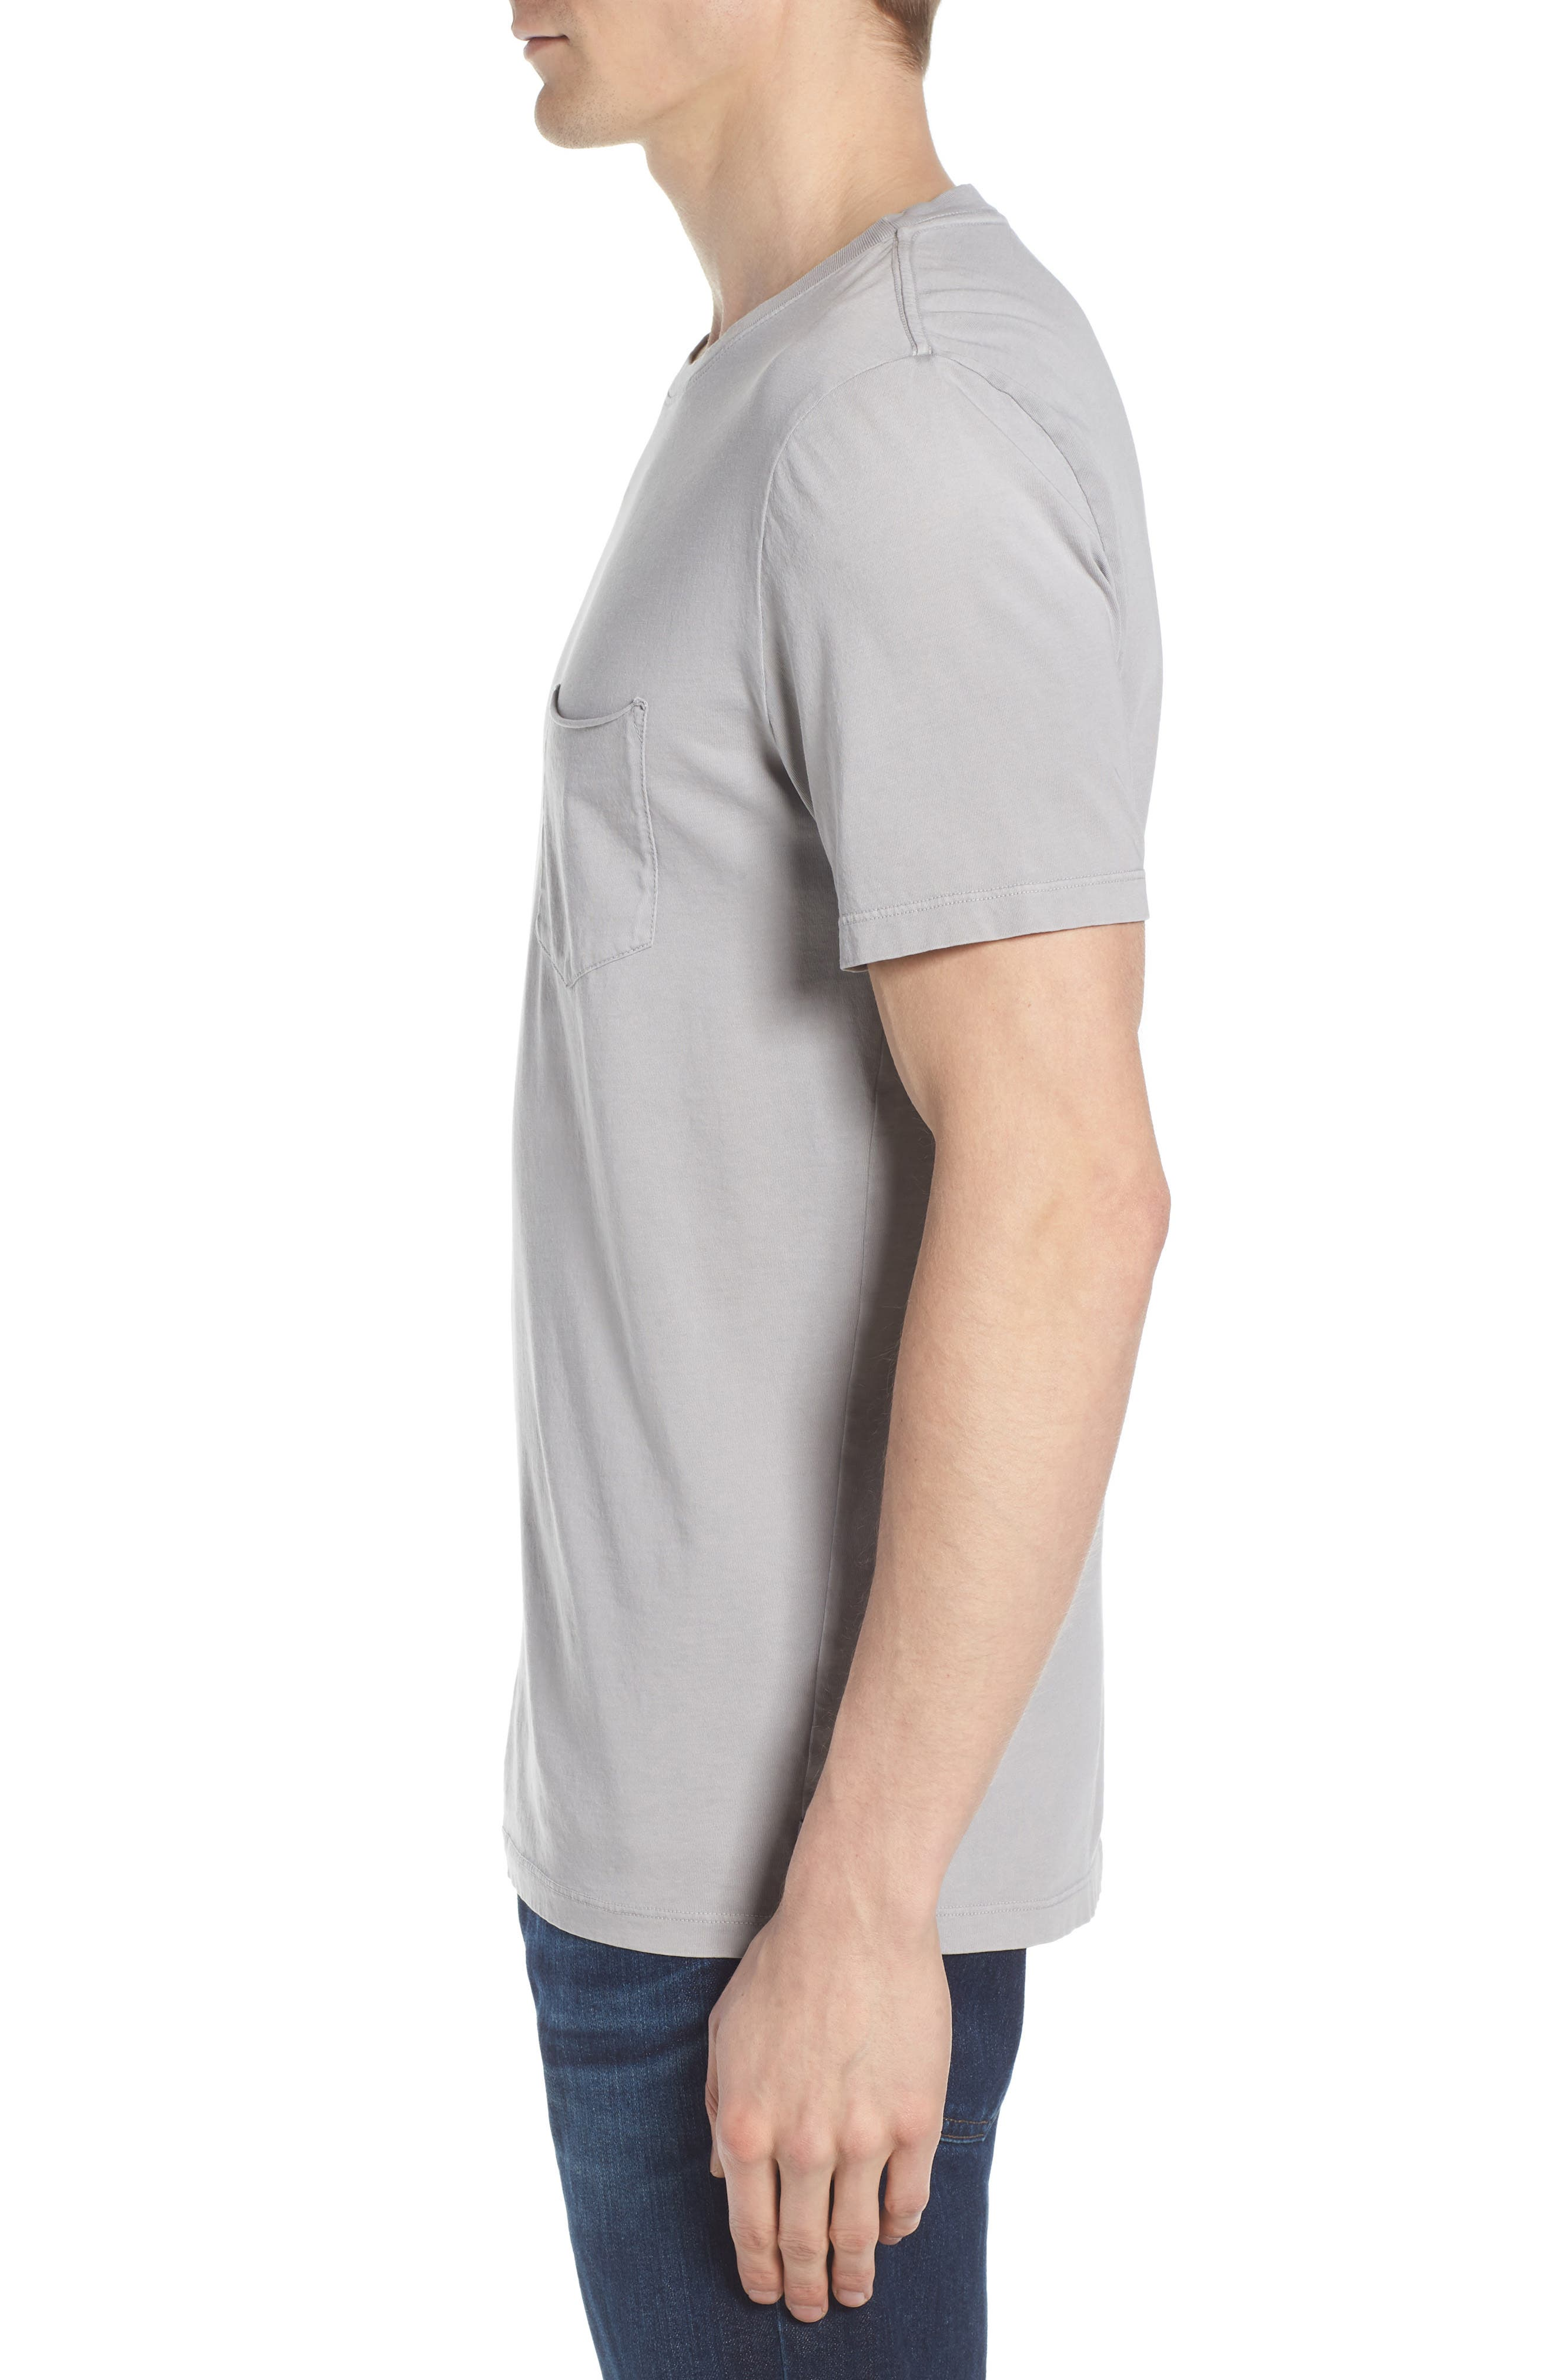 Anders Slim Fit Pocket T-Shirt,                             Alternate thumbnail 3, color,                             SUN FADED PEBBLE BEACH